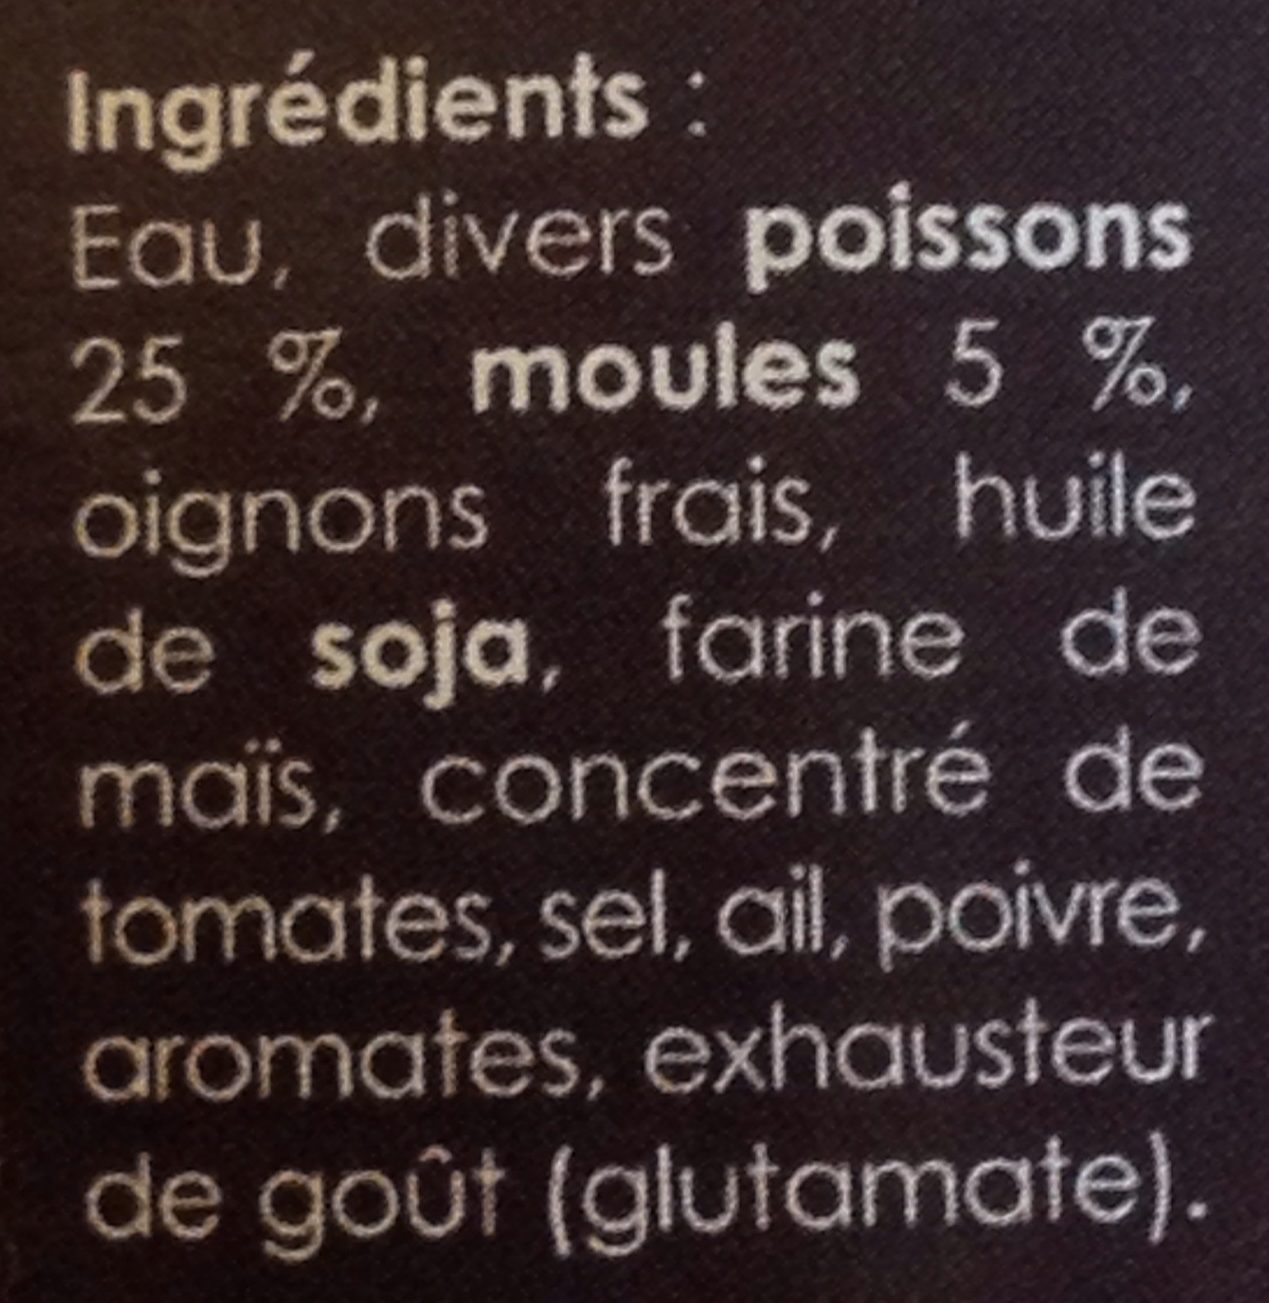 Soupe de poisson - Ingrediënten - fr